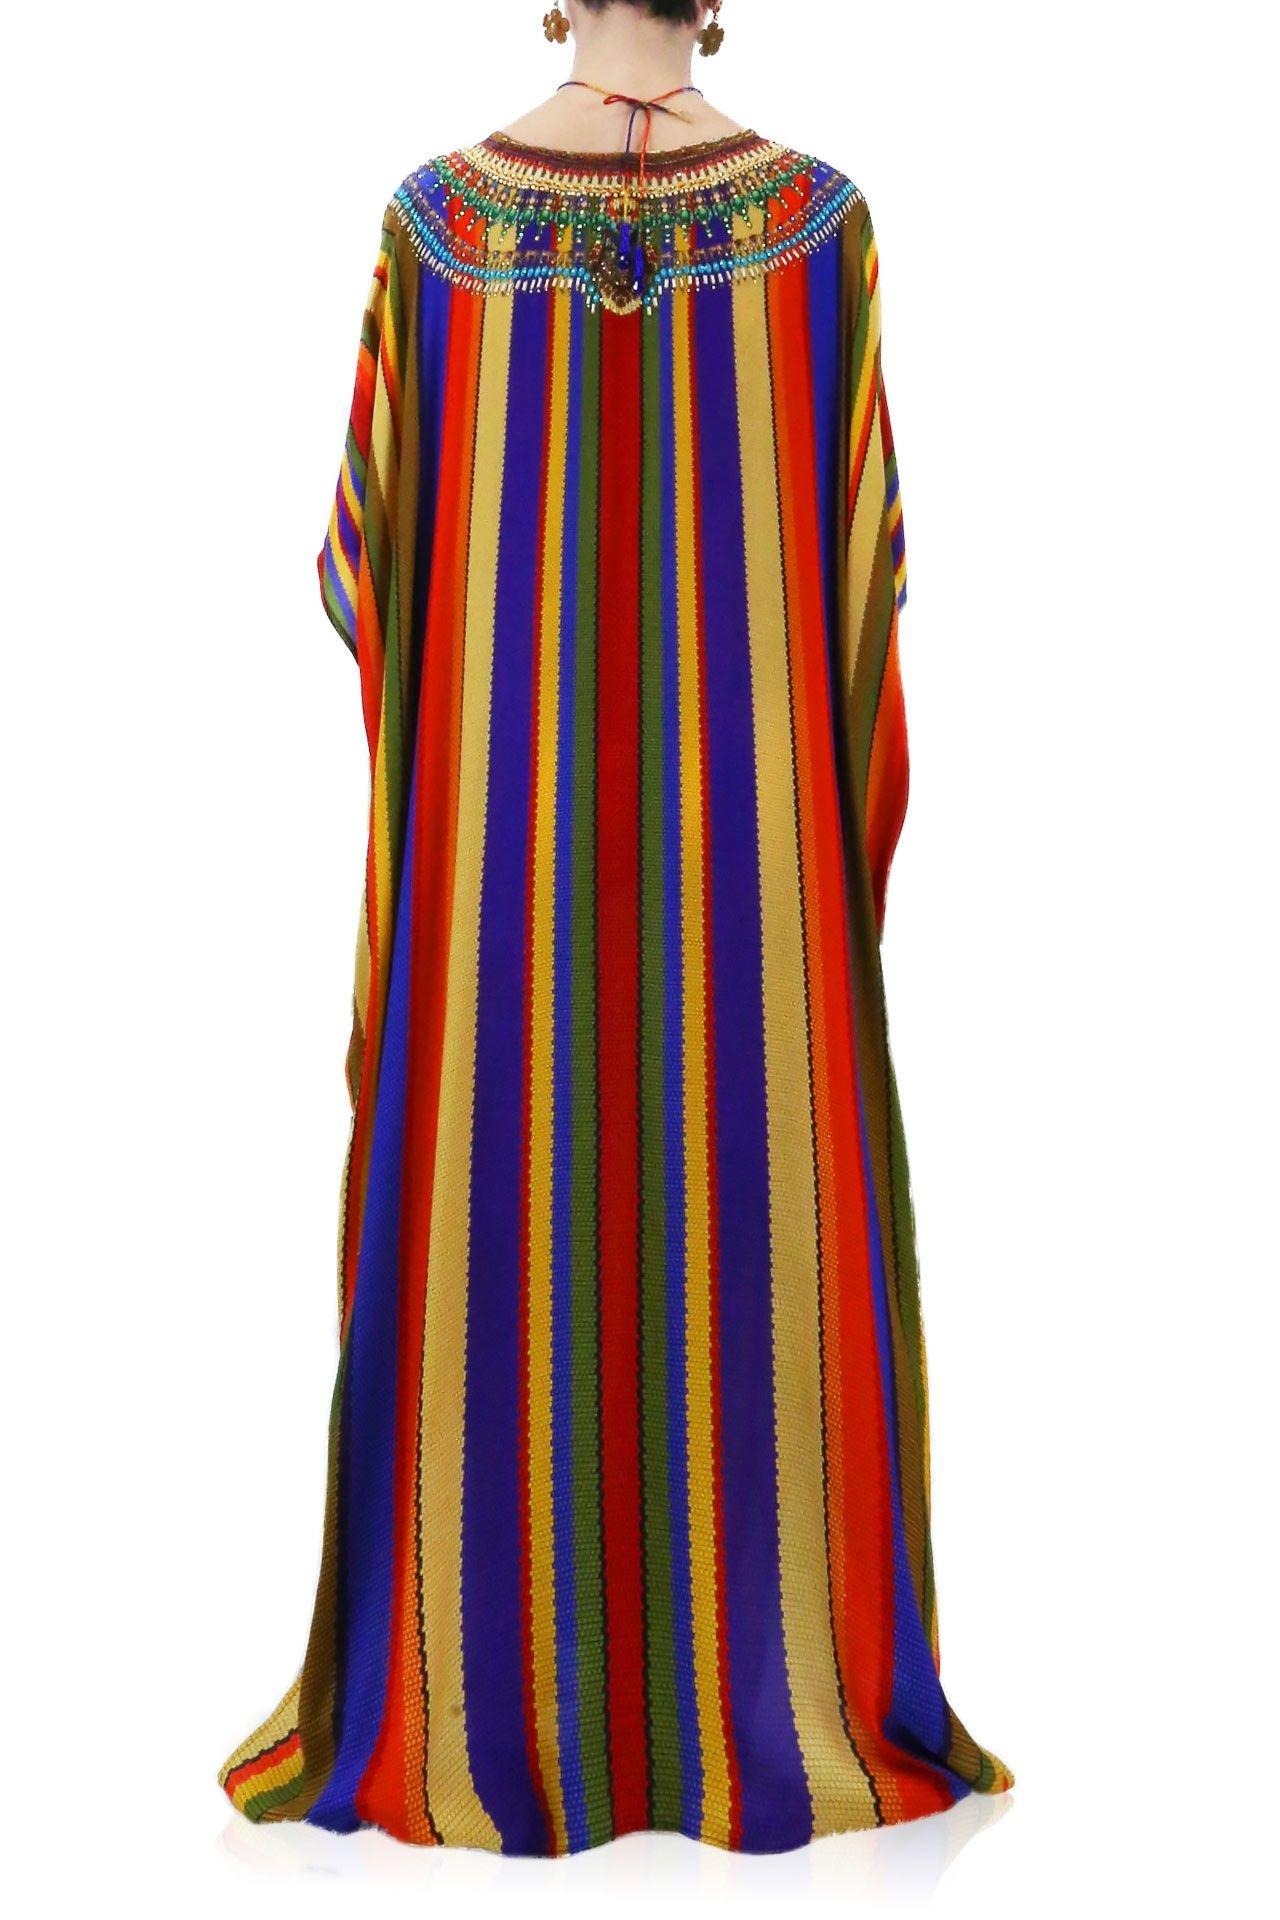 c2a34aa9ab0 Plus Size Silk Kaftans | Long Silk Caftans| Kaftan Dress in the USA -  Shahida Parides®